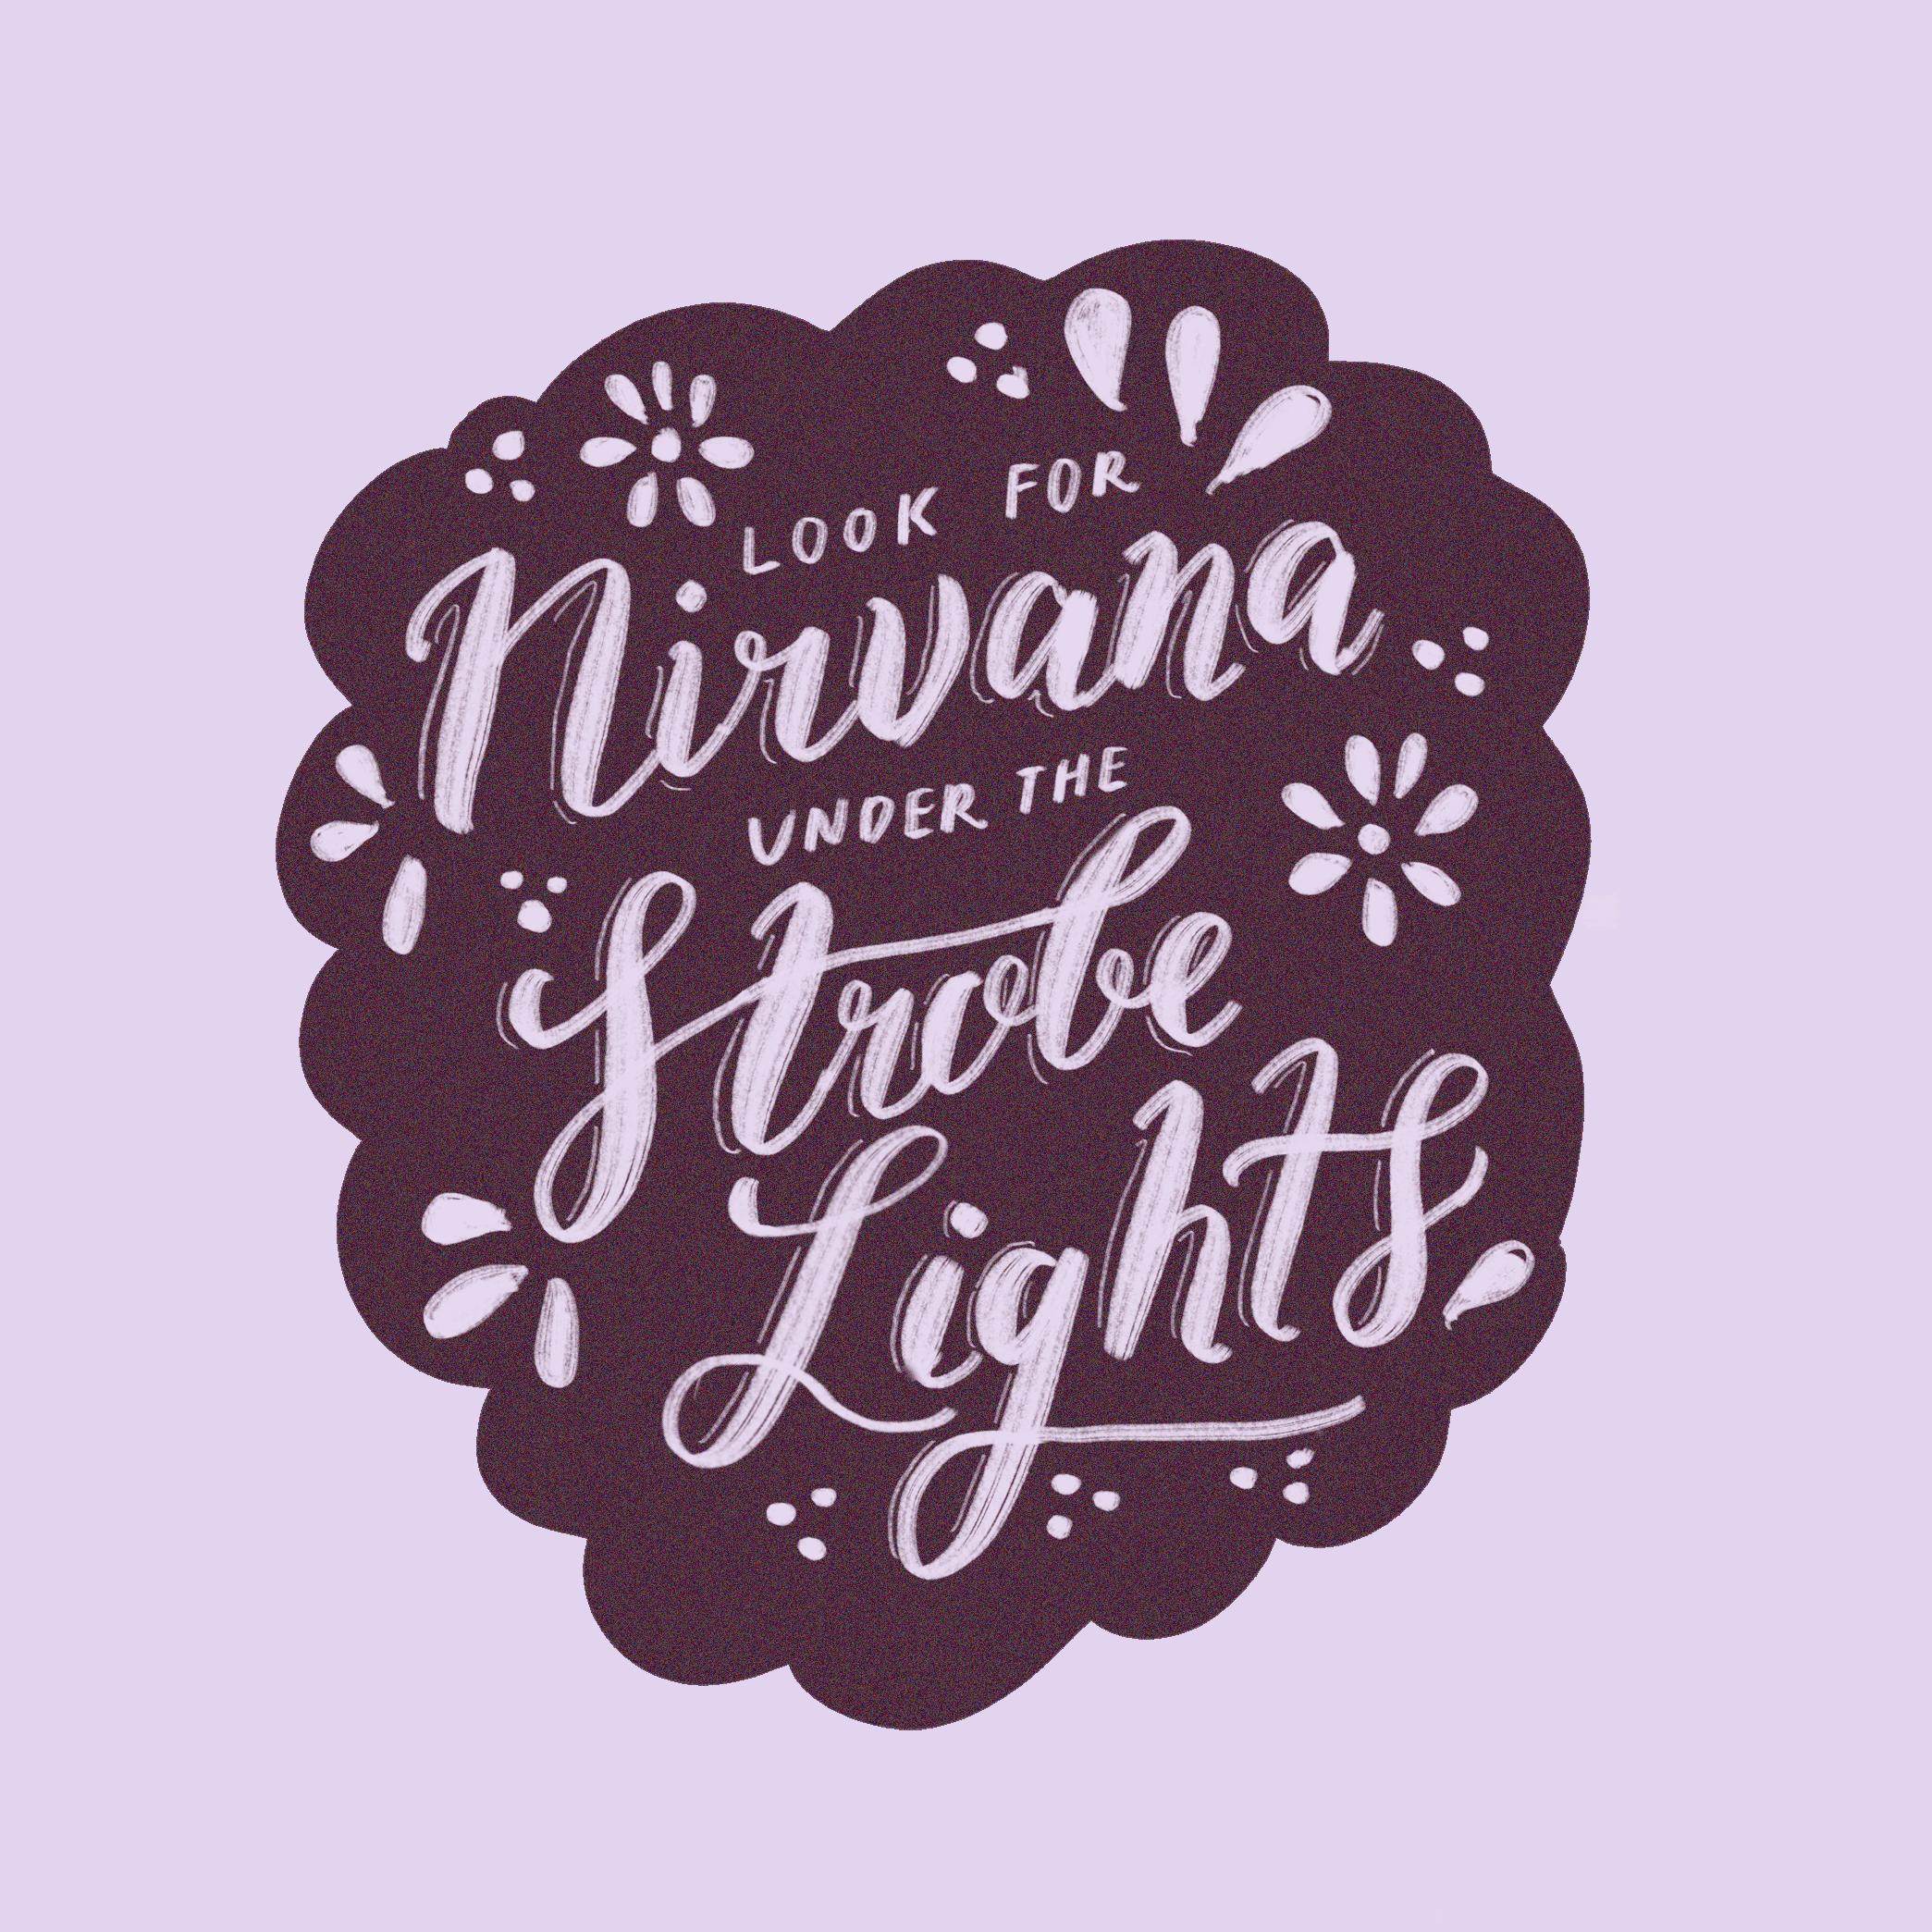 look-for-nirvana-under-the-strobe-lights-IG